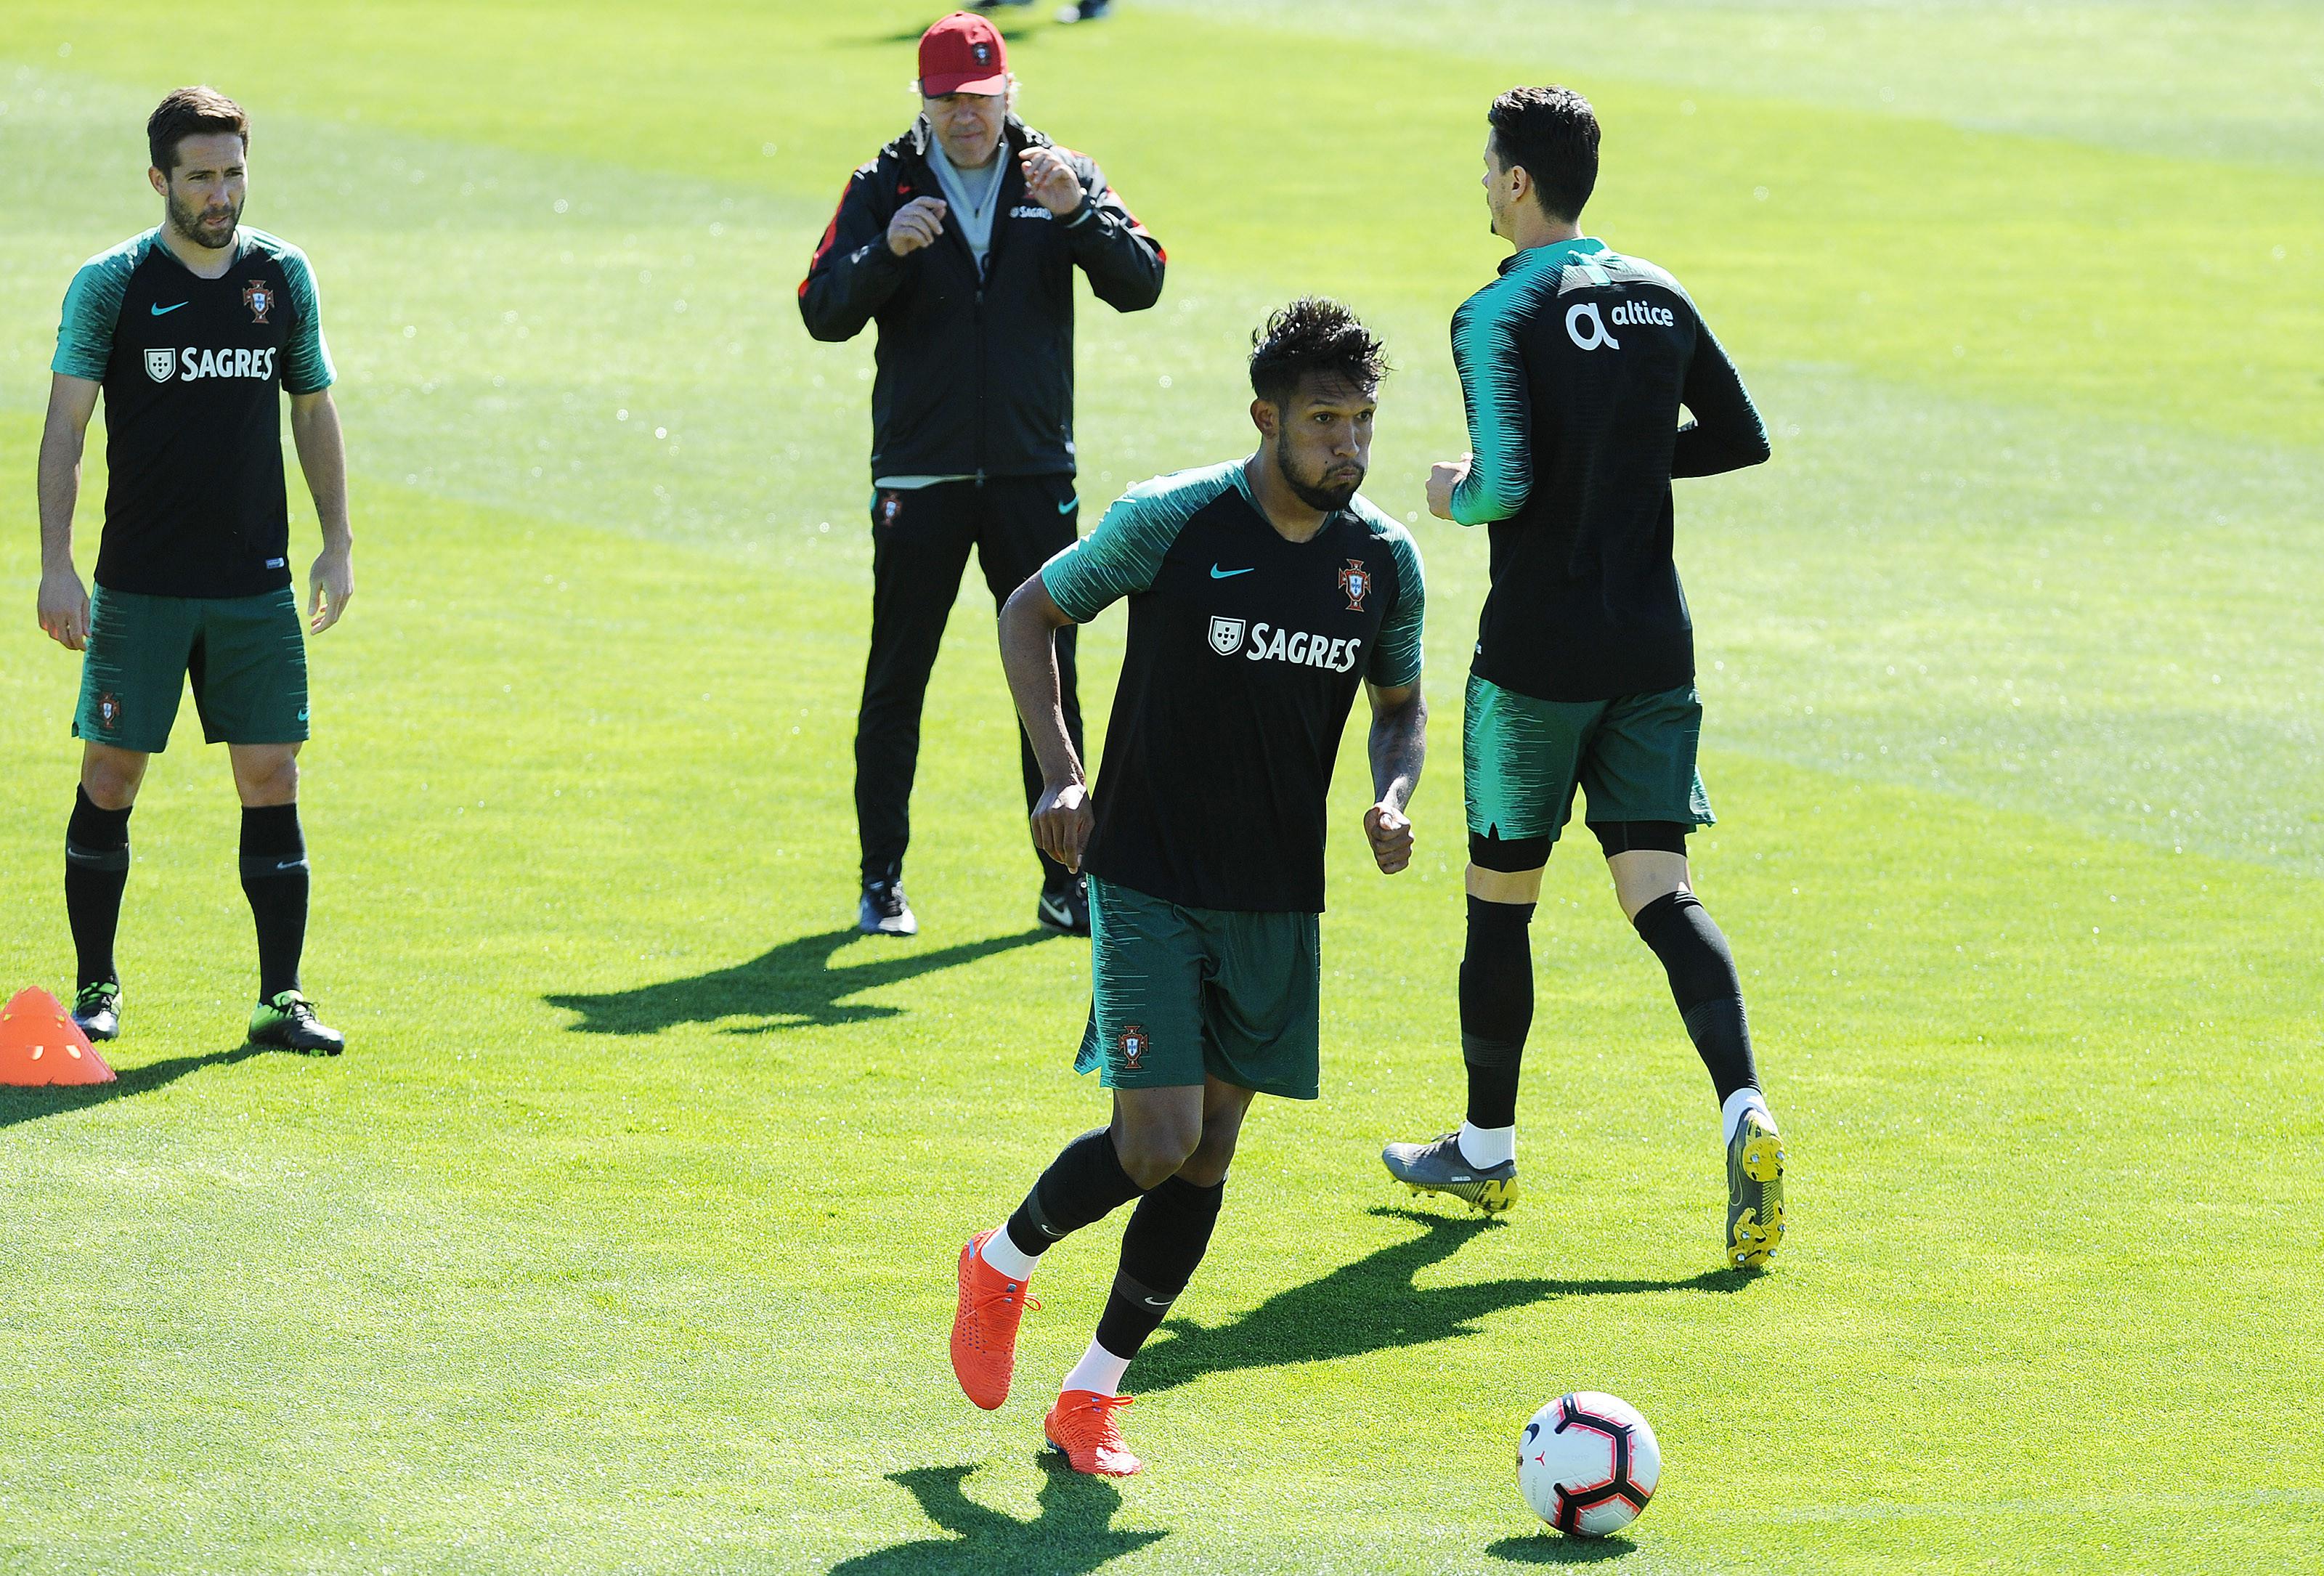 Dyego Sousa passa a ser o 7.º jogador naturalizado a representar Portugal